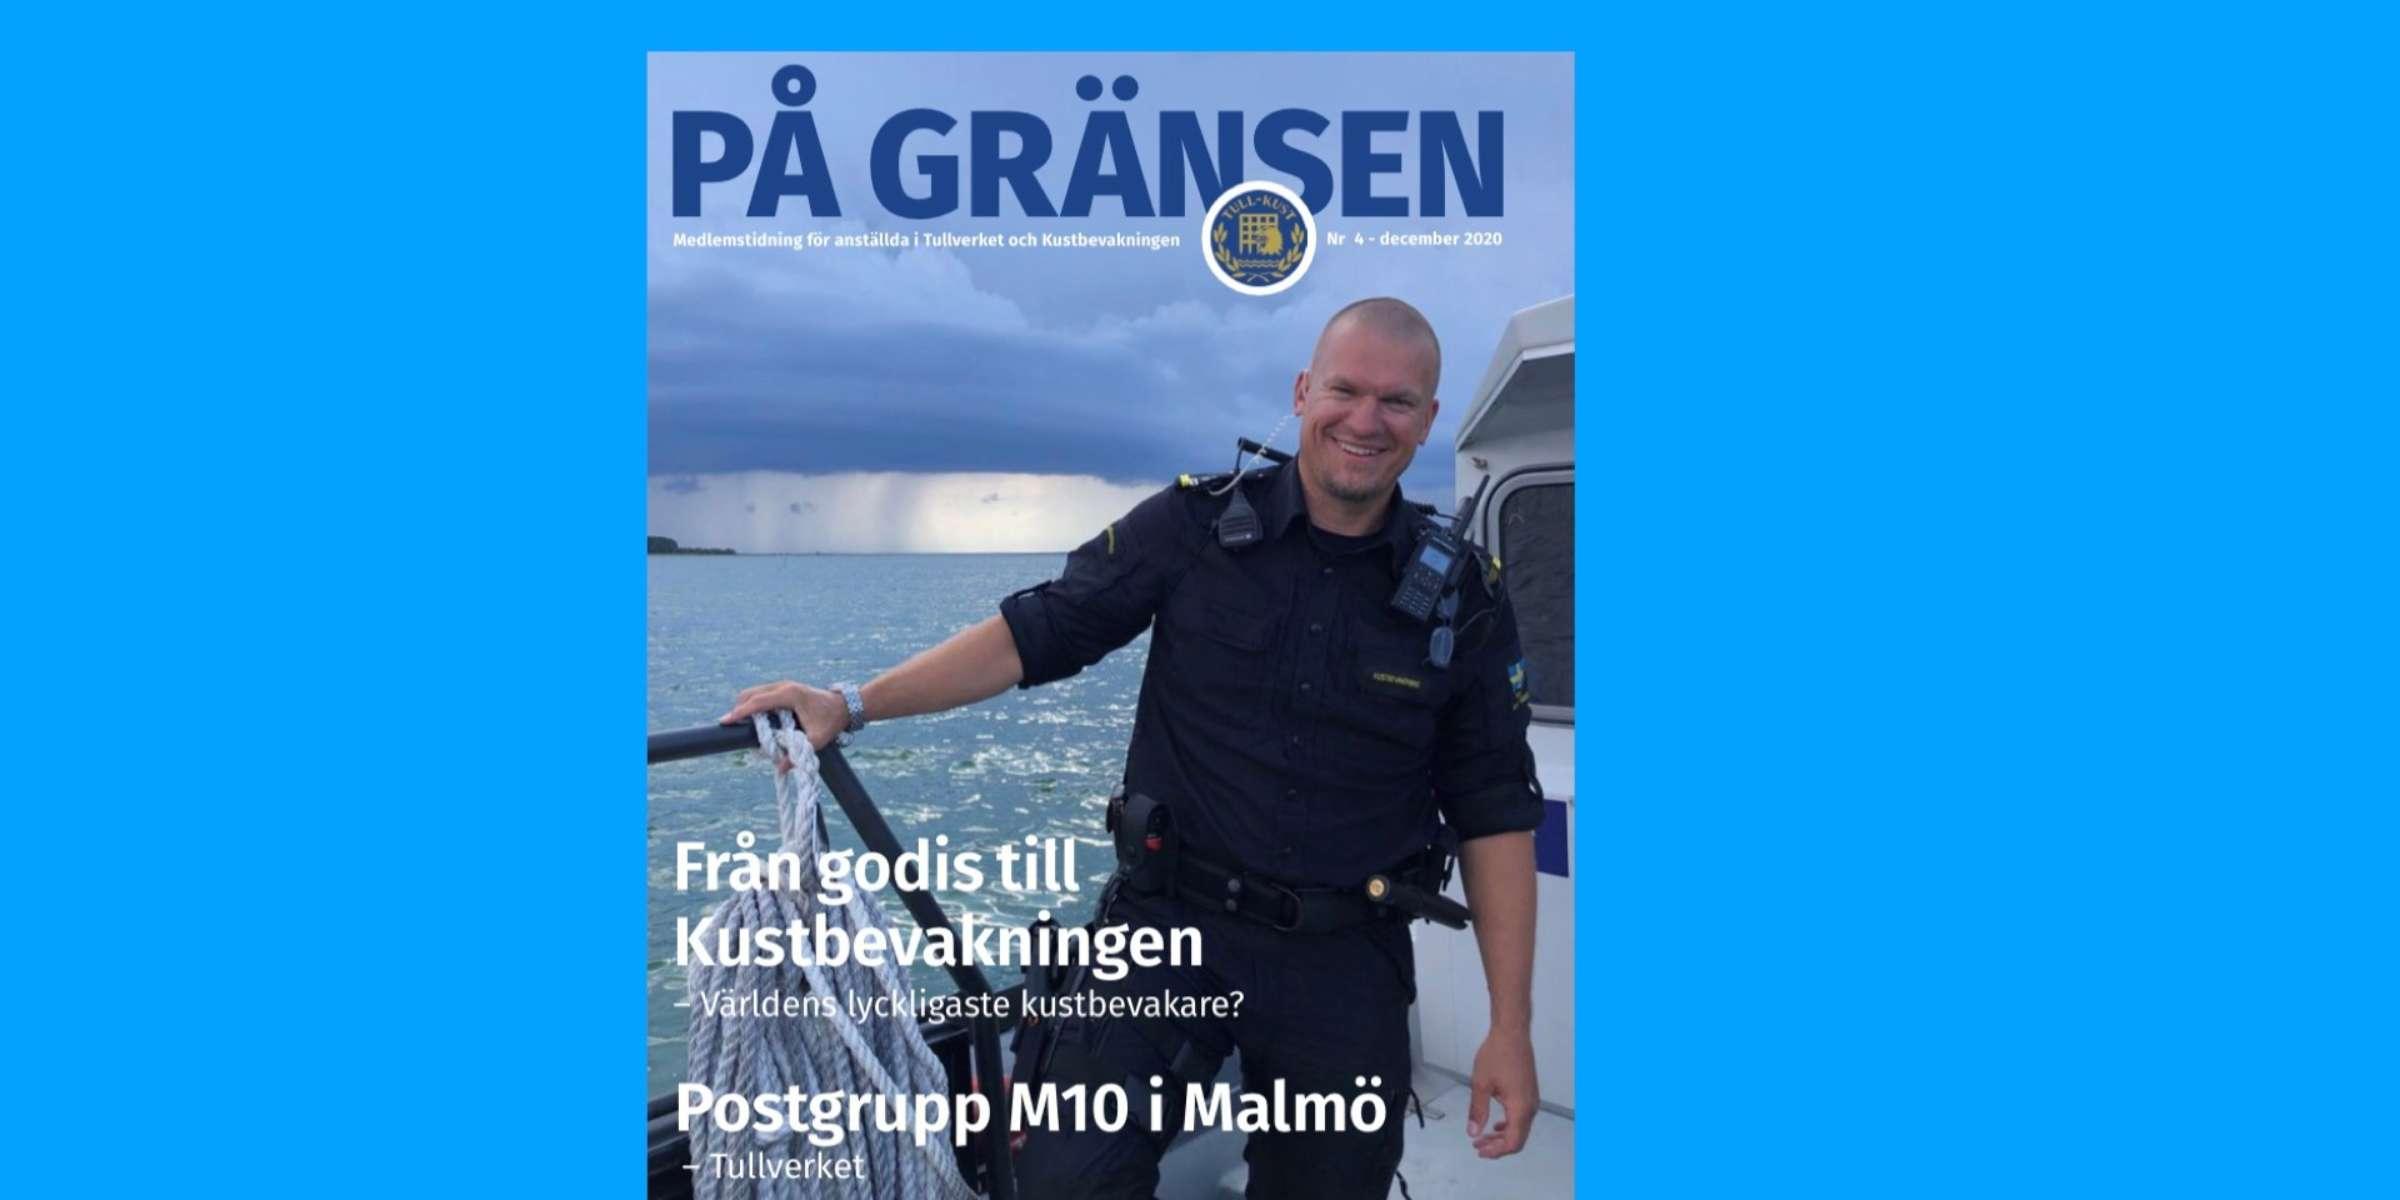 PA GRANSEN2020 4